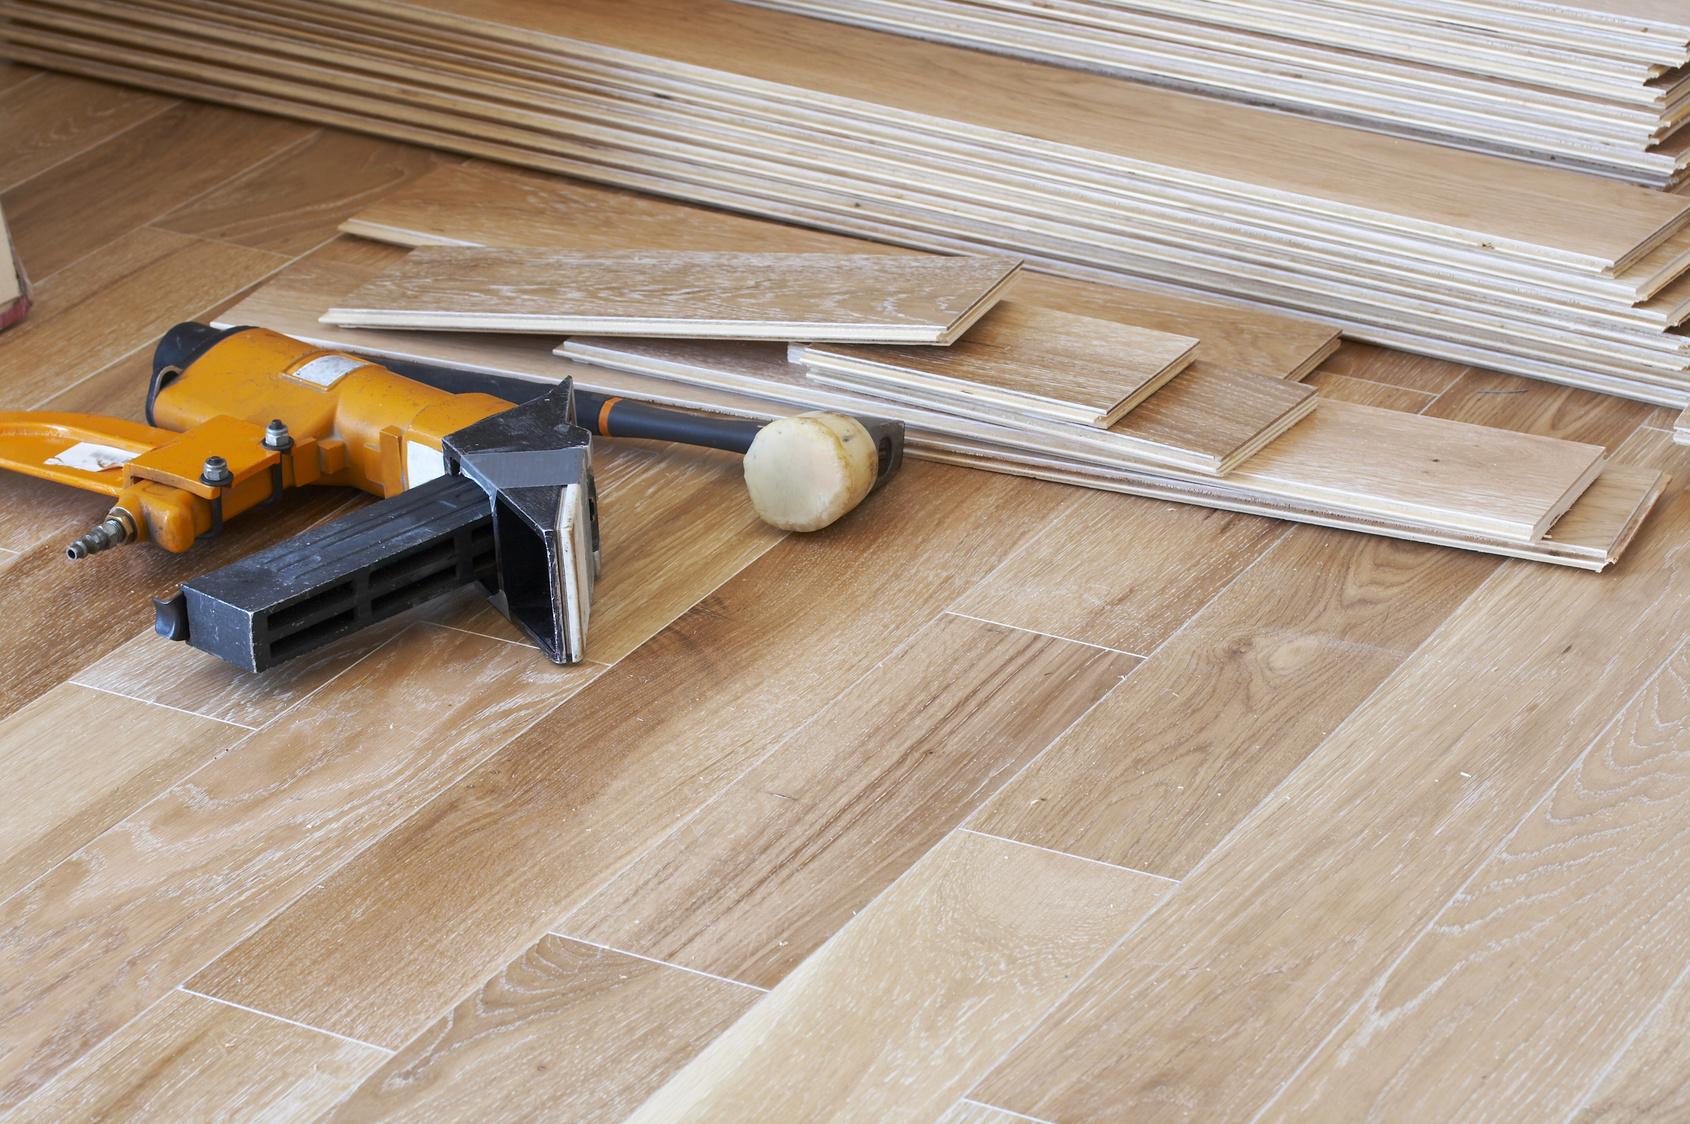 Brian's Carpet & Commercial Flooring - 5401 Haverhill Rd, West Palm Beach, FL 33407